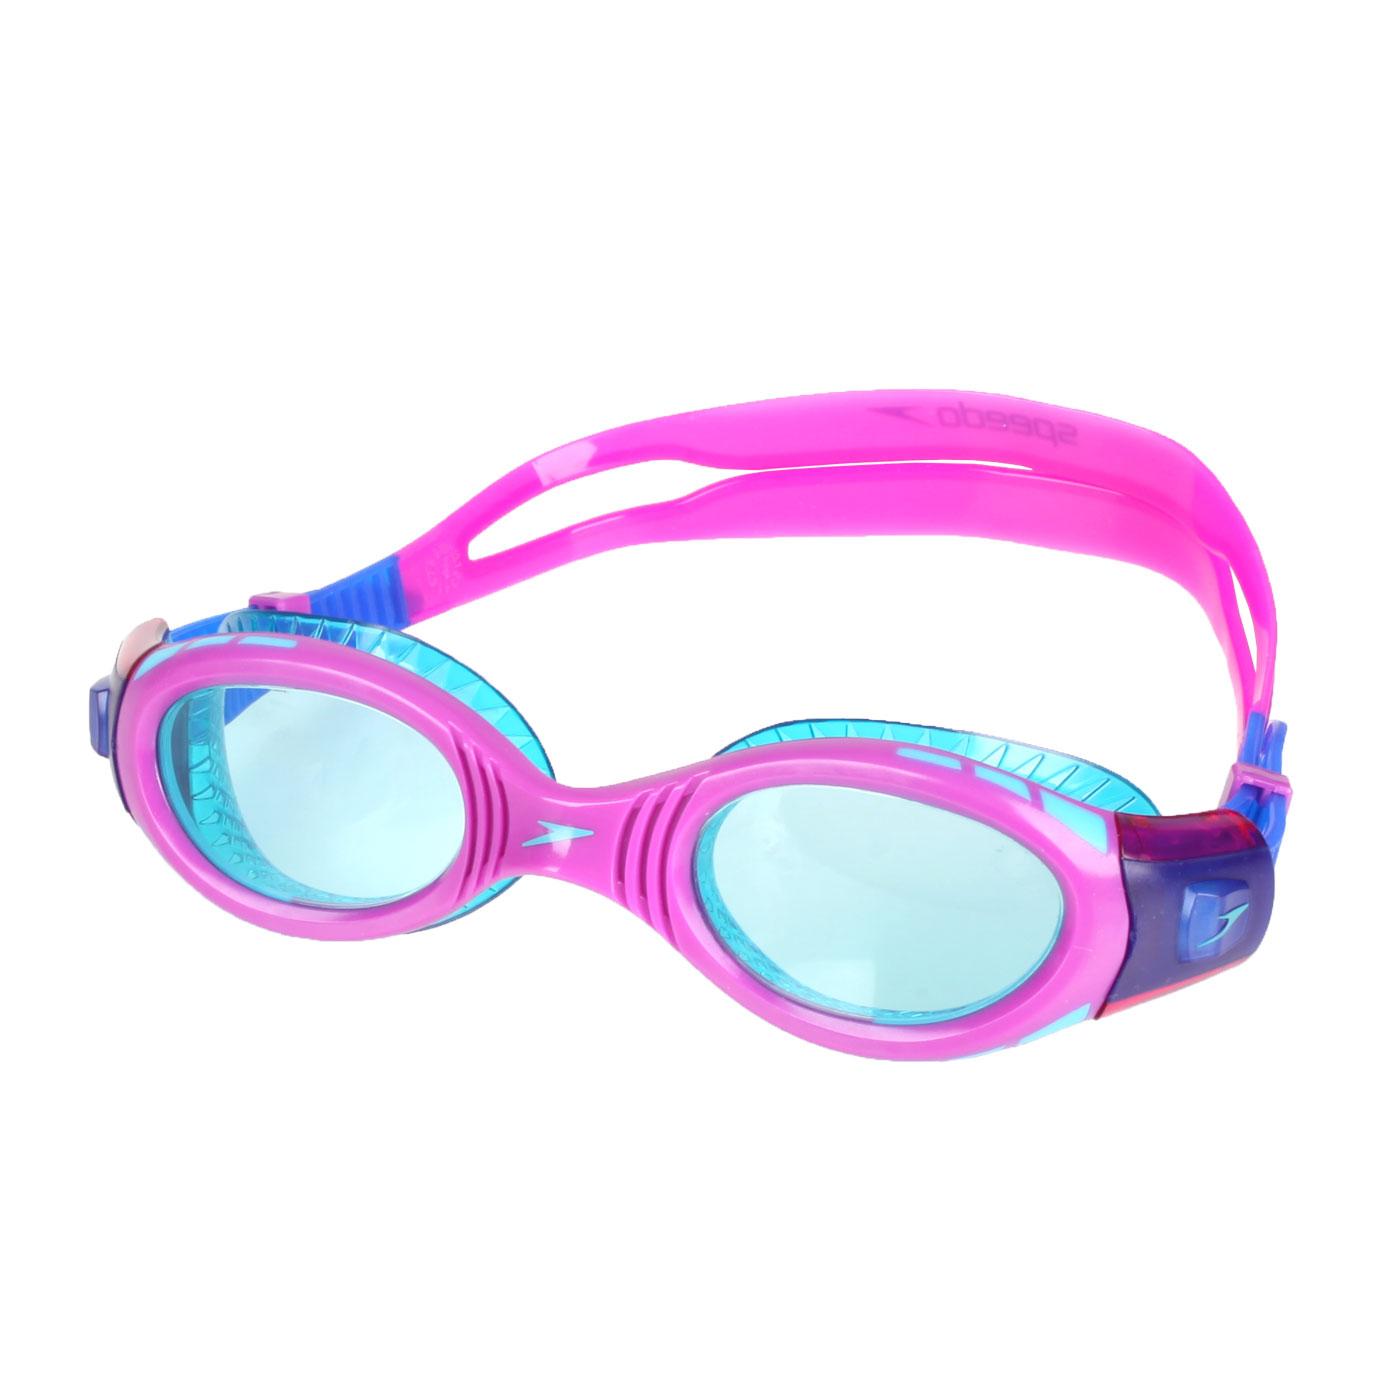 SPEEDO 兒童運動泳鏡 SD811595C585N - 紫湖水綠